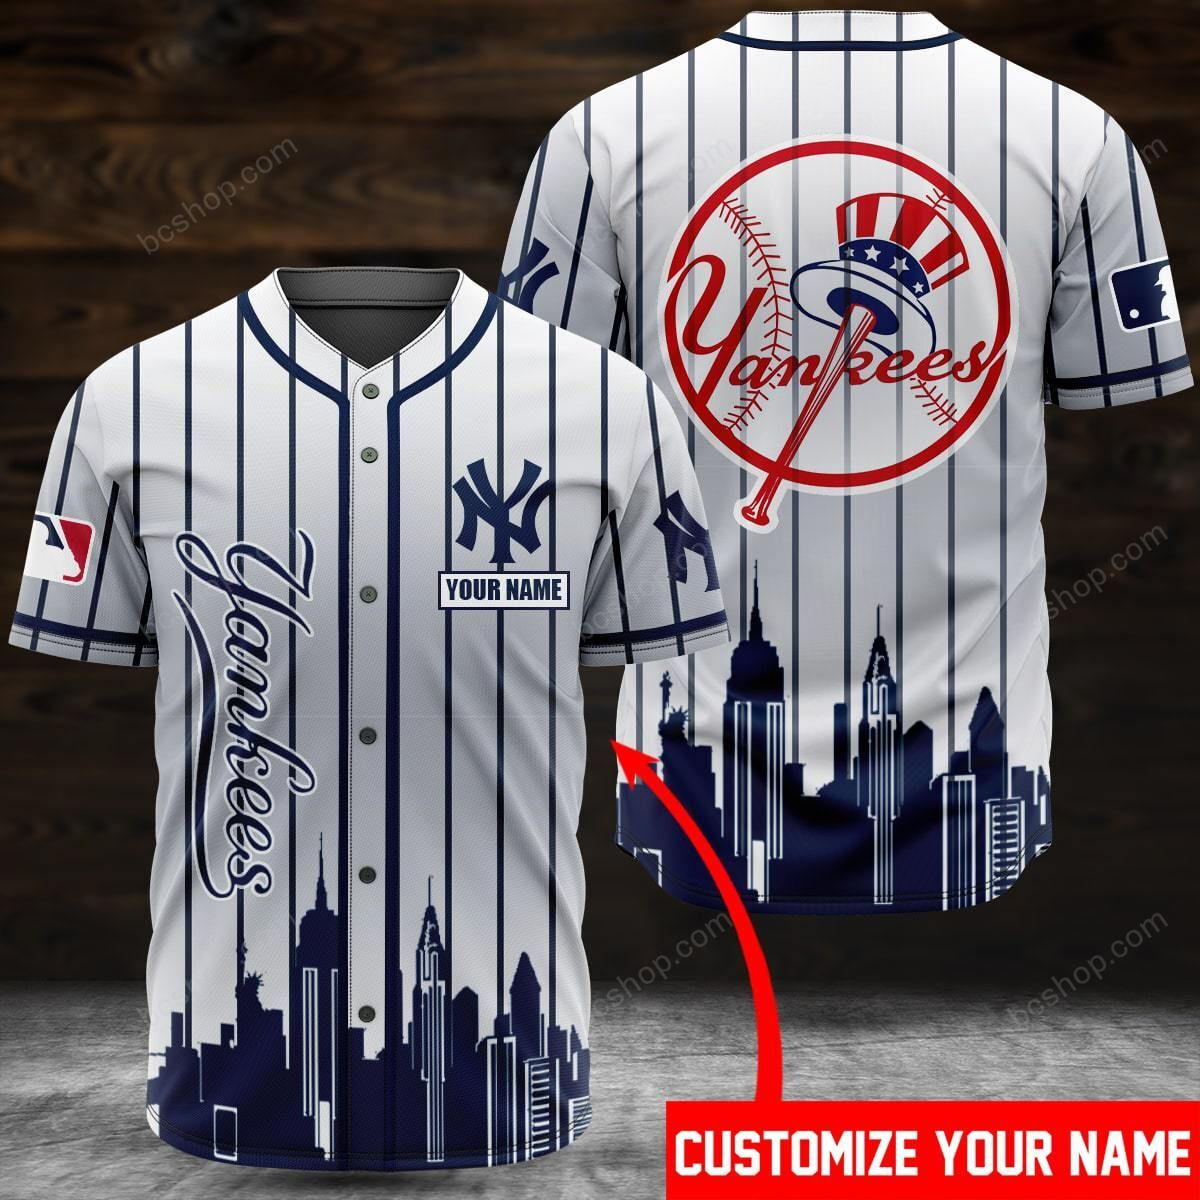 NYC Yankees custom name baseball jersey - LIMITED EDITION